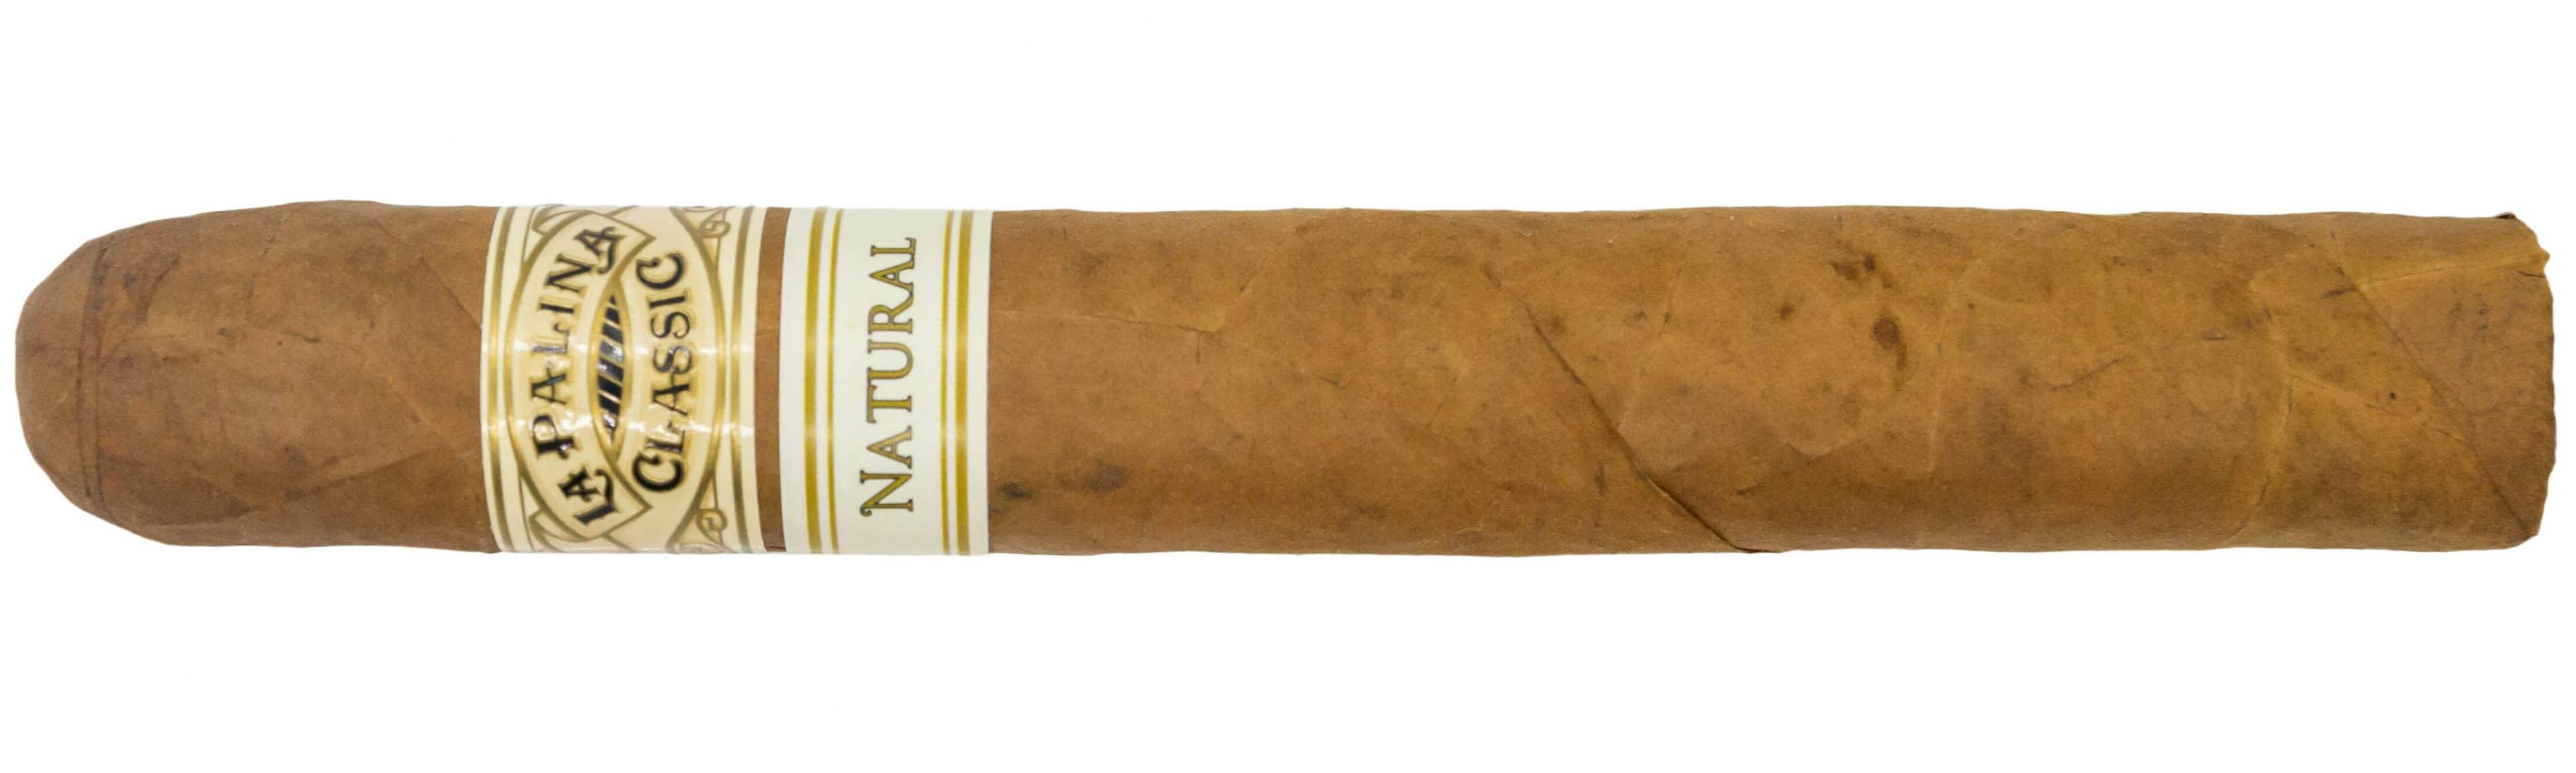 Blind Cigar Review: La Palina   Classic Natural Toro